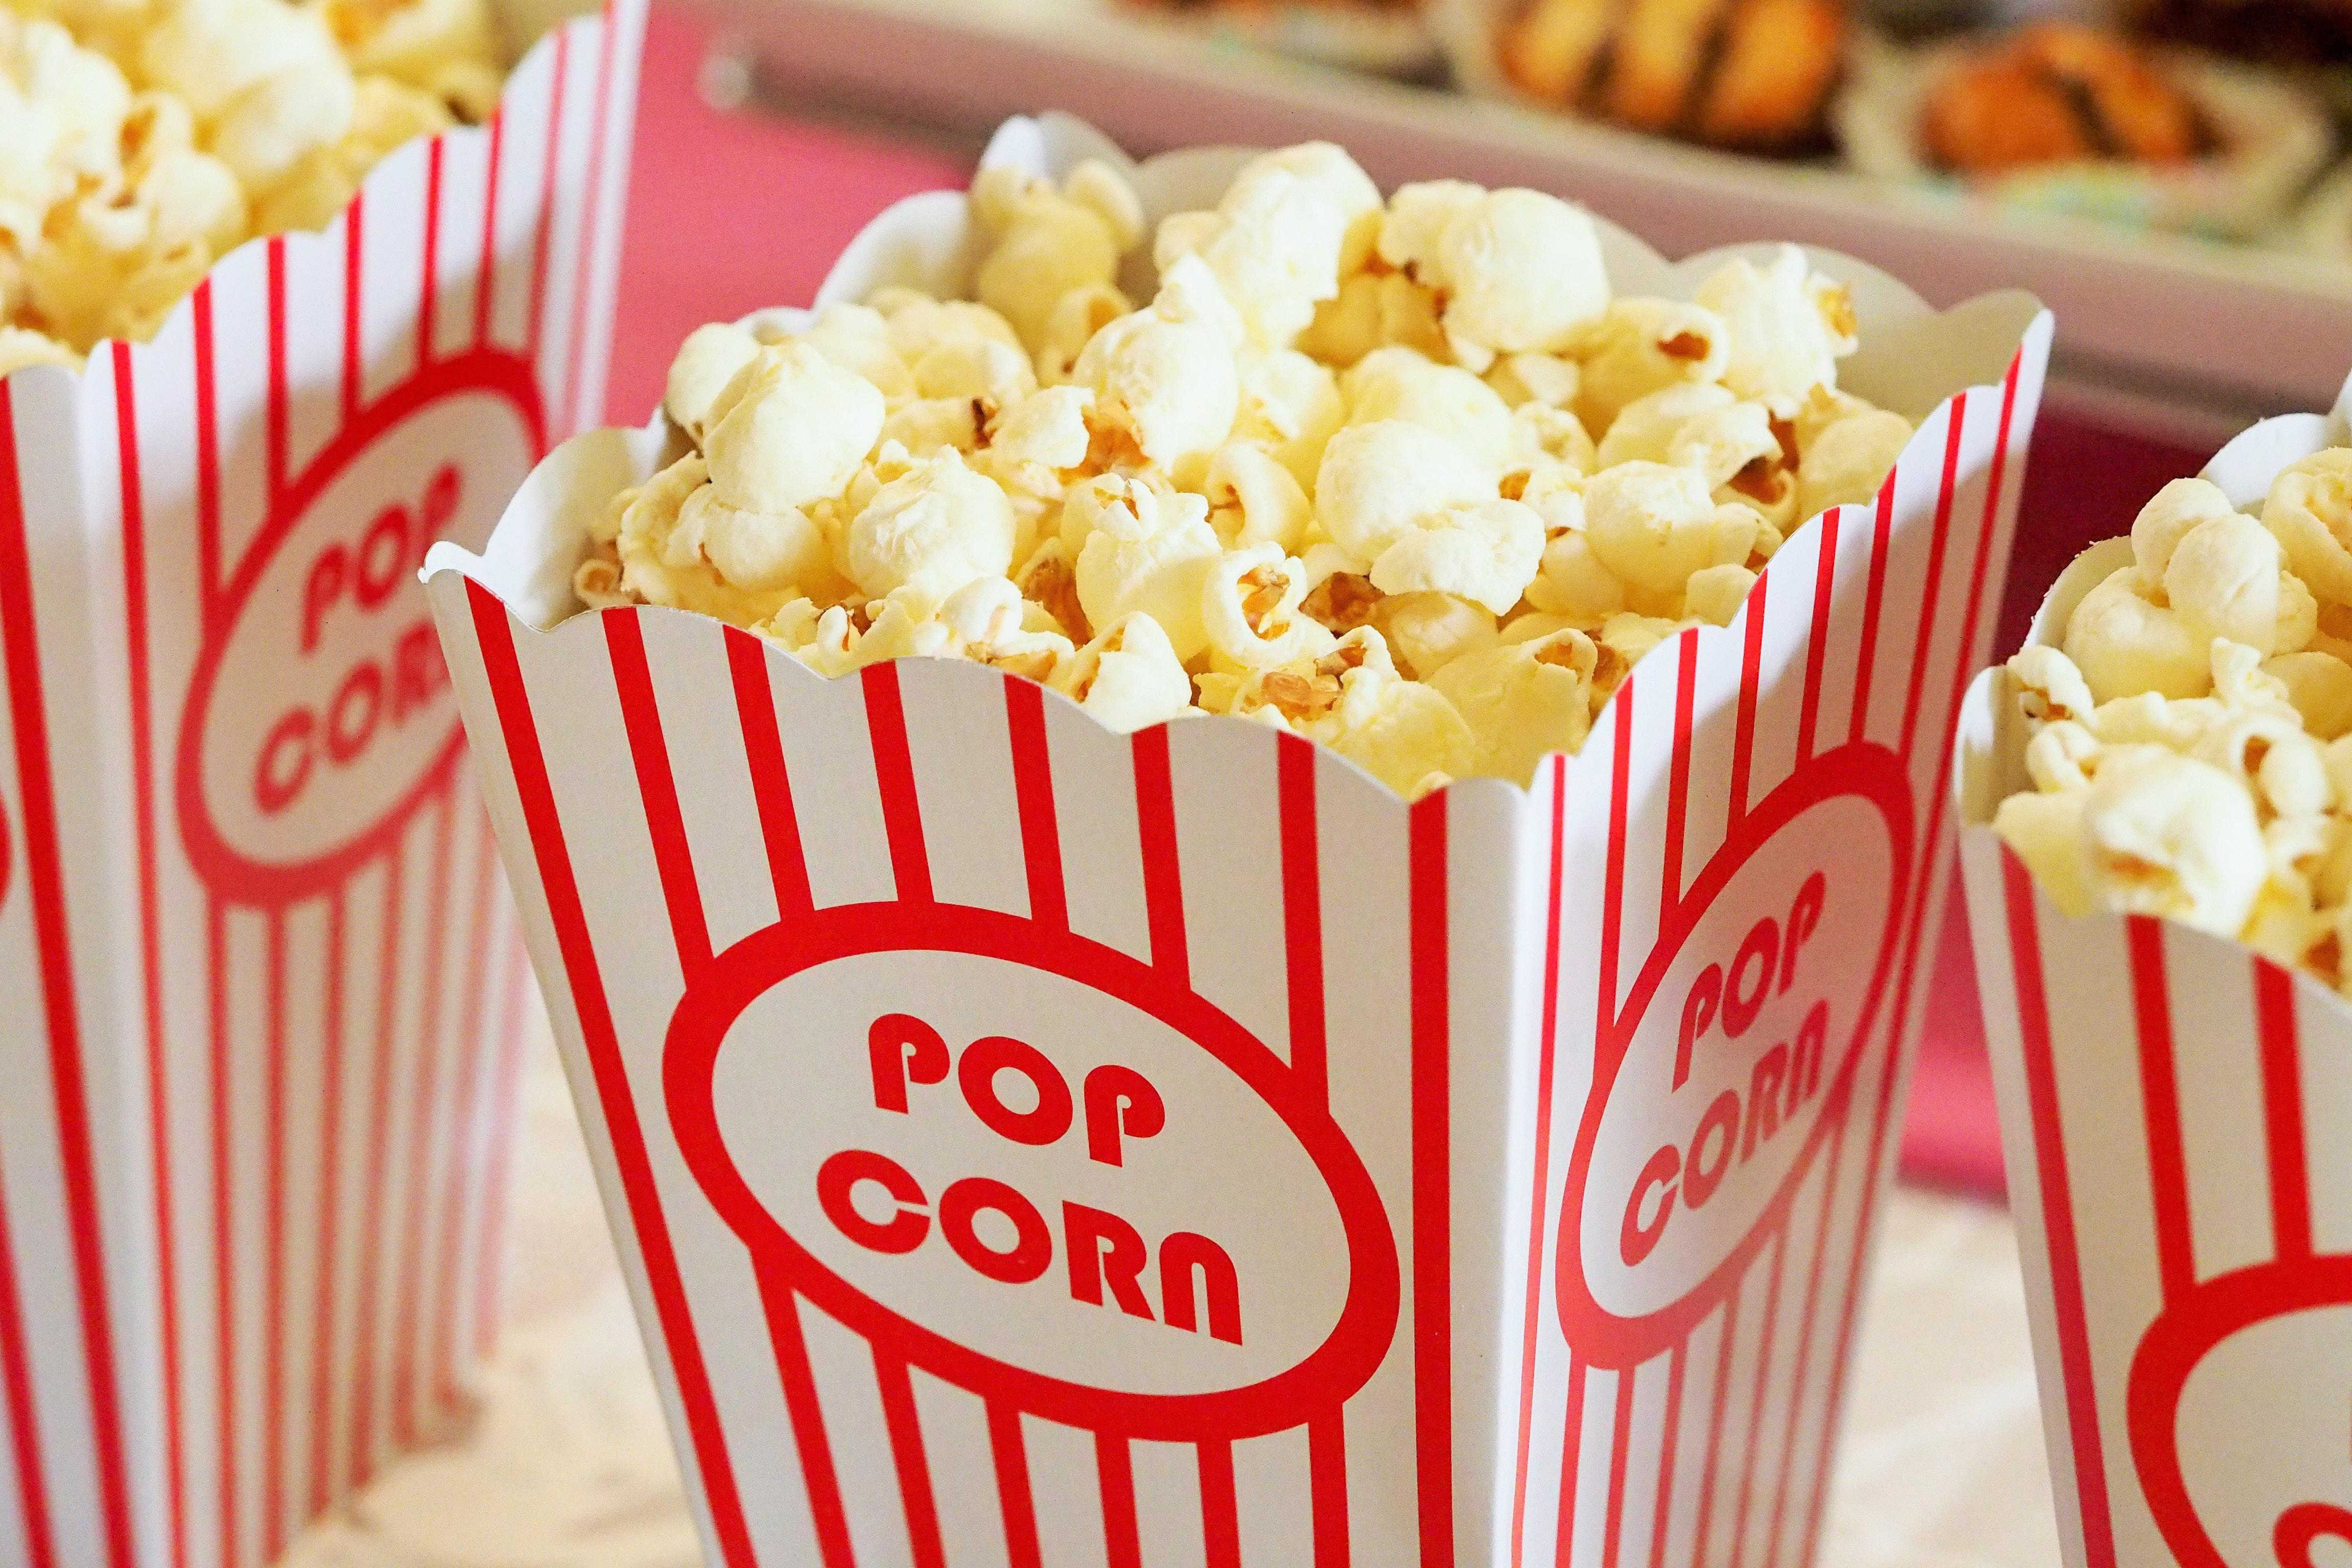 Movie Popcorn Image